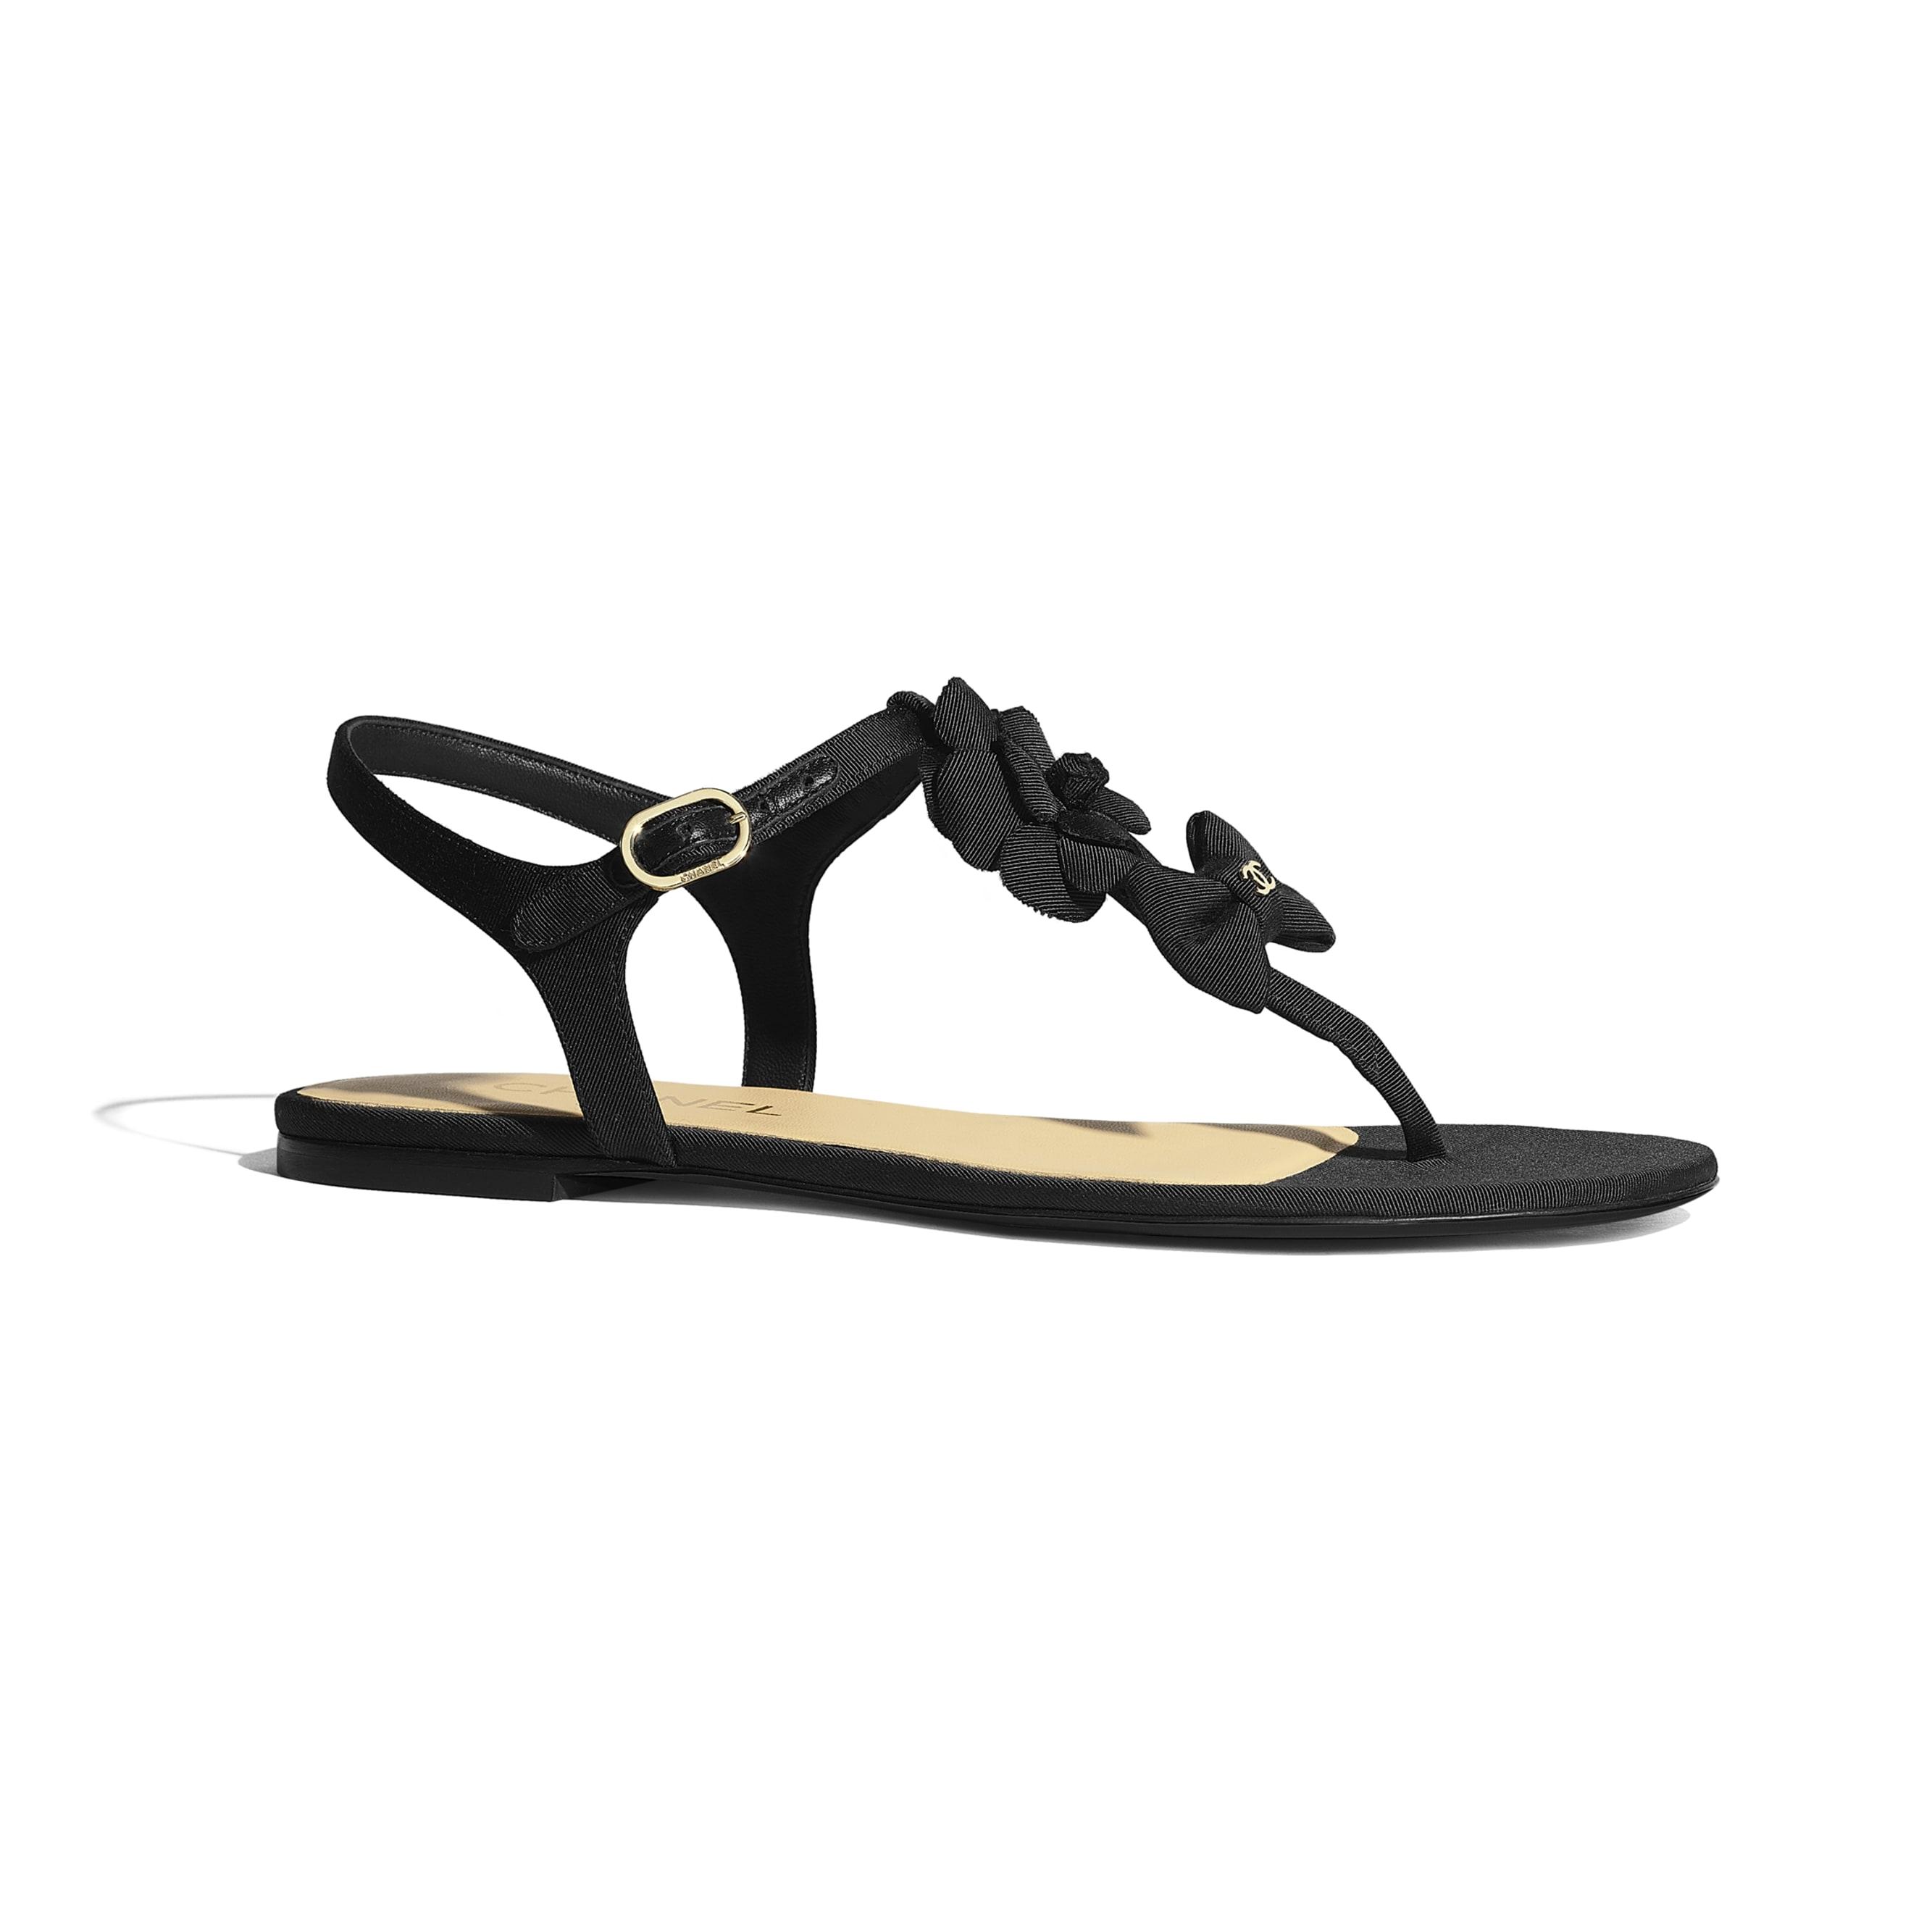 Sandals - Black - Grosgrain - Default view - see standard sized version